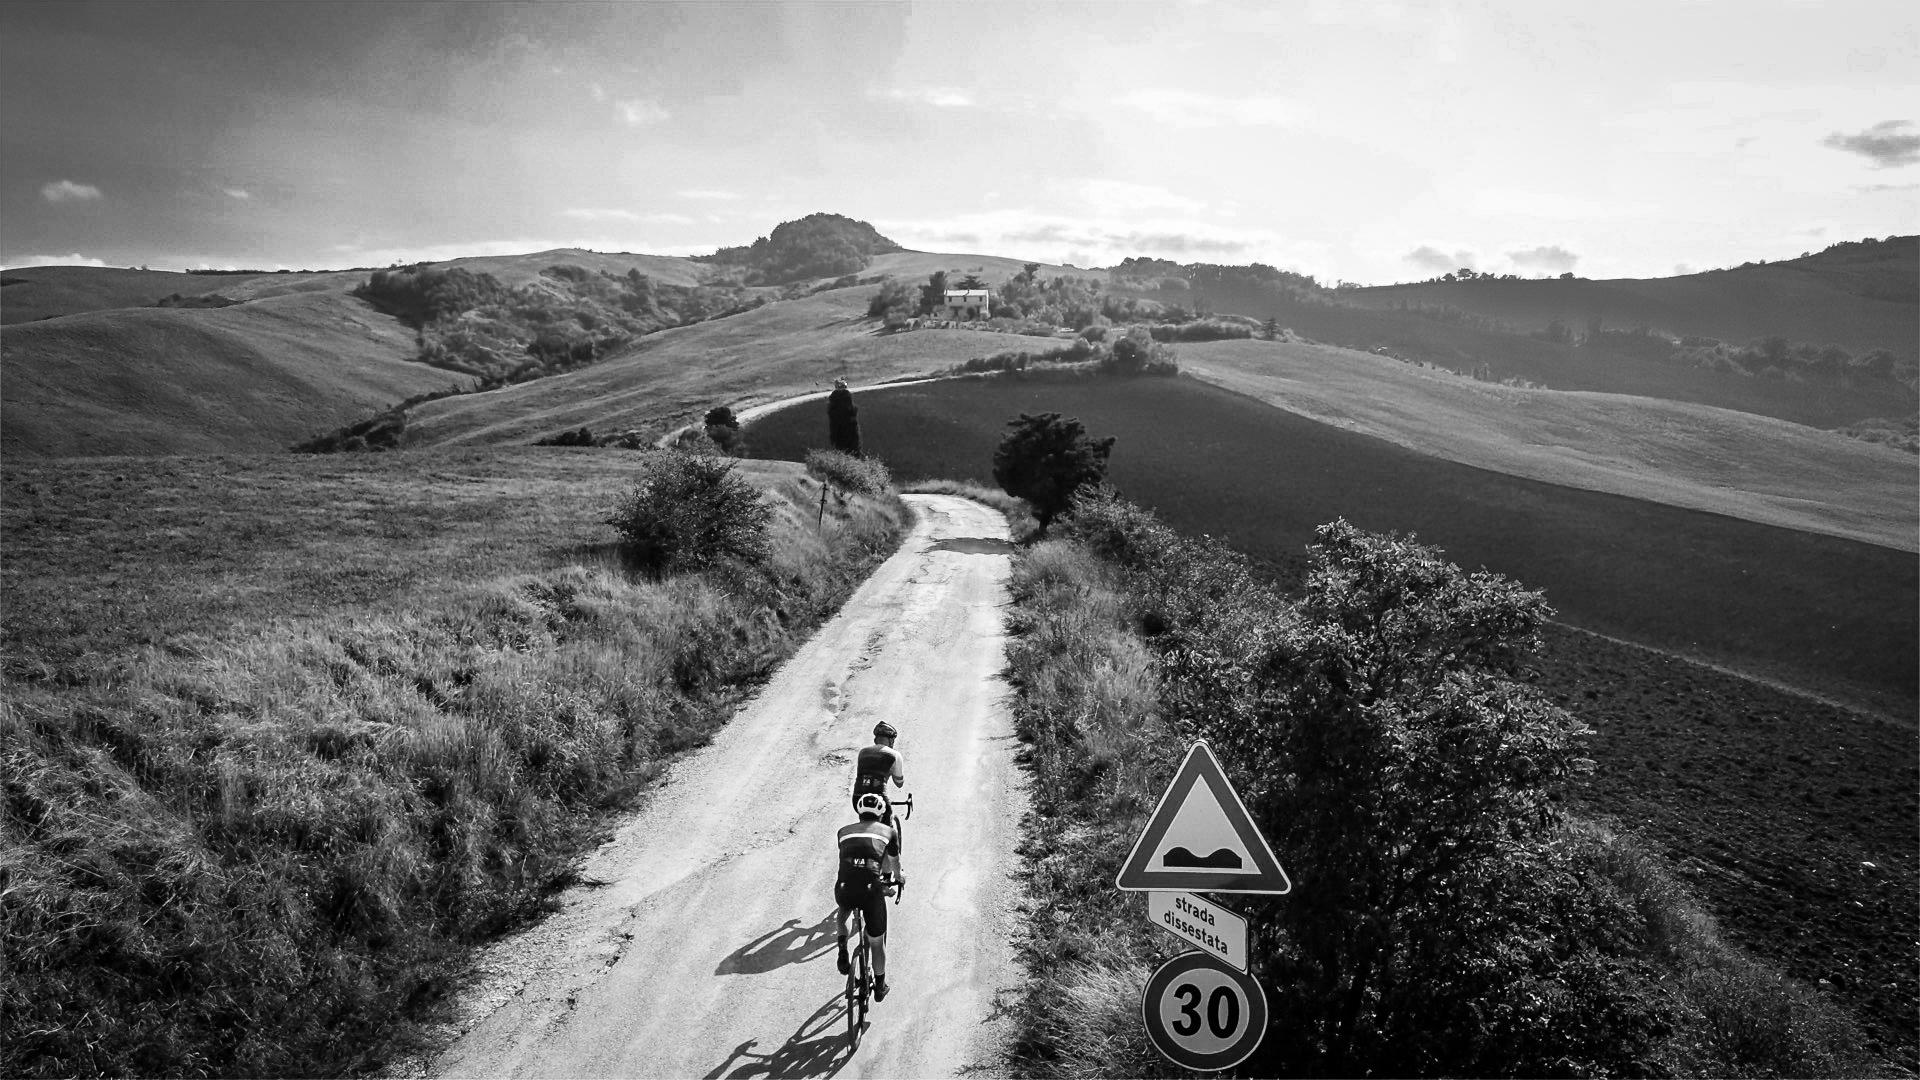 Gravel bike - Gravel style - drone view